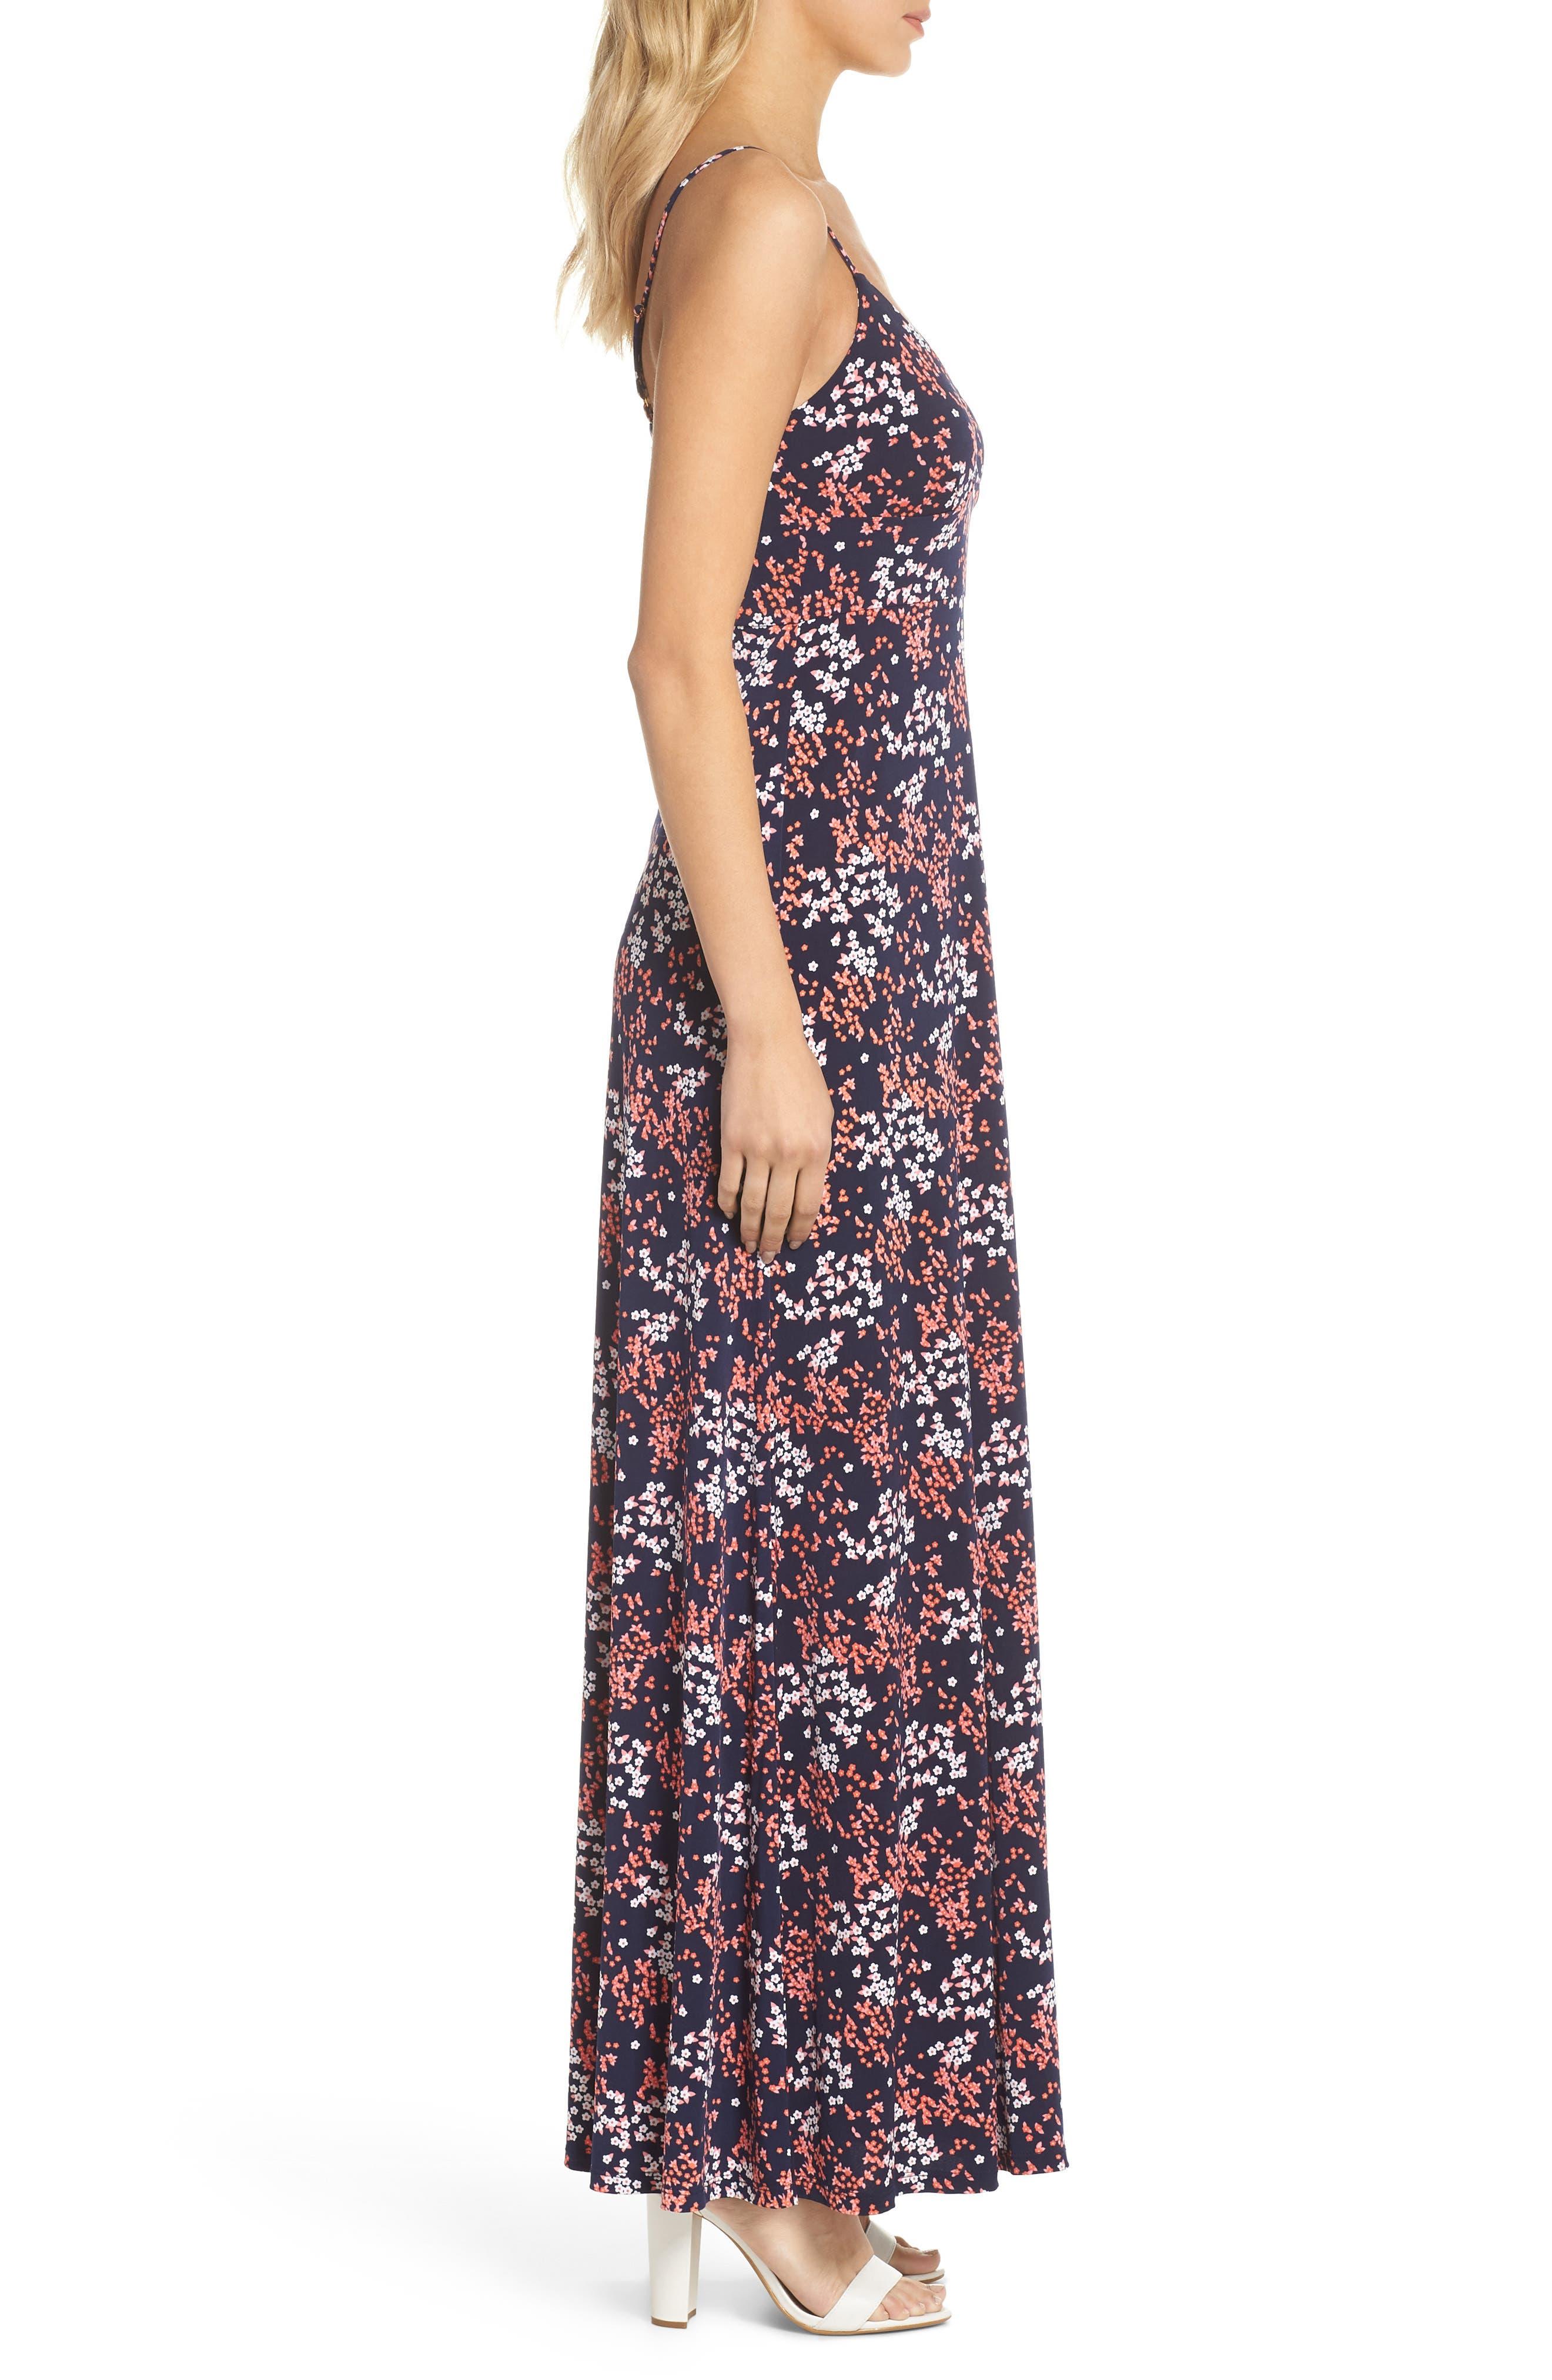 Bloom Maxi Dress,                             Alternate thumbnail 3, color,                             True Navy/ Bight Blush